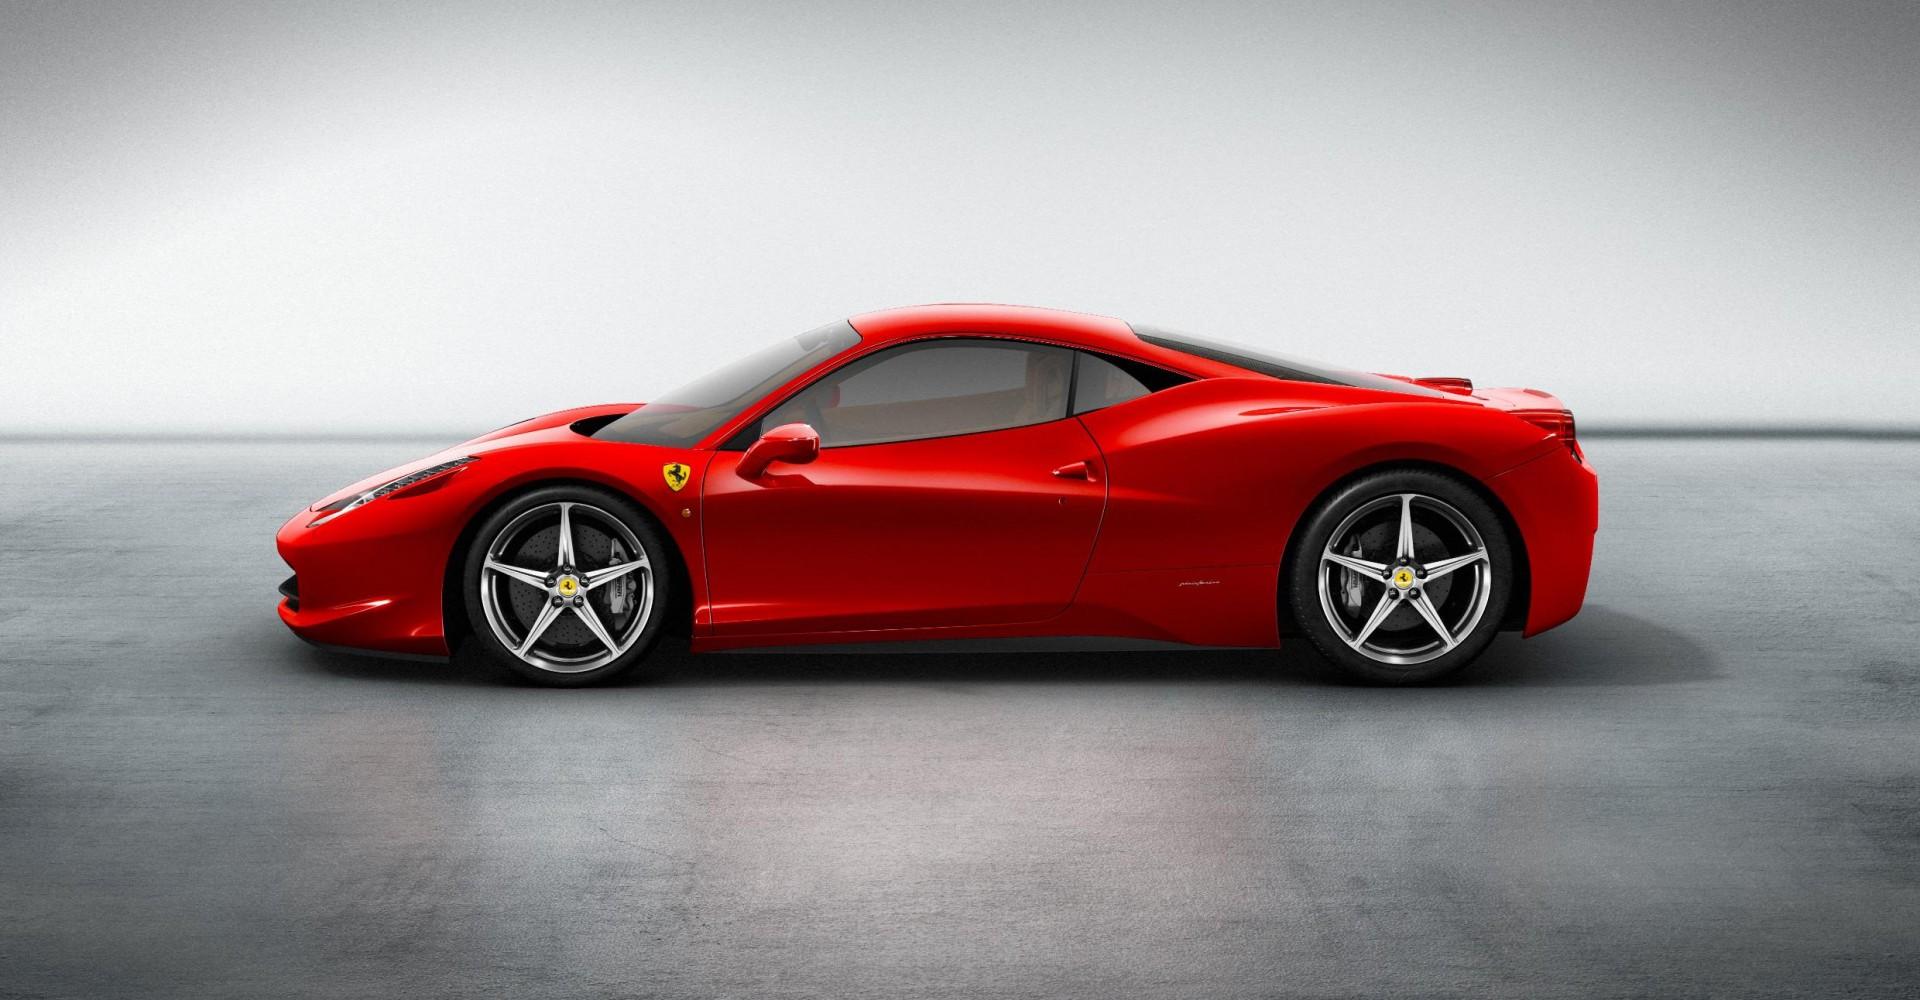 Man Crashes Rented Ferrari Into Taxi